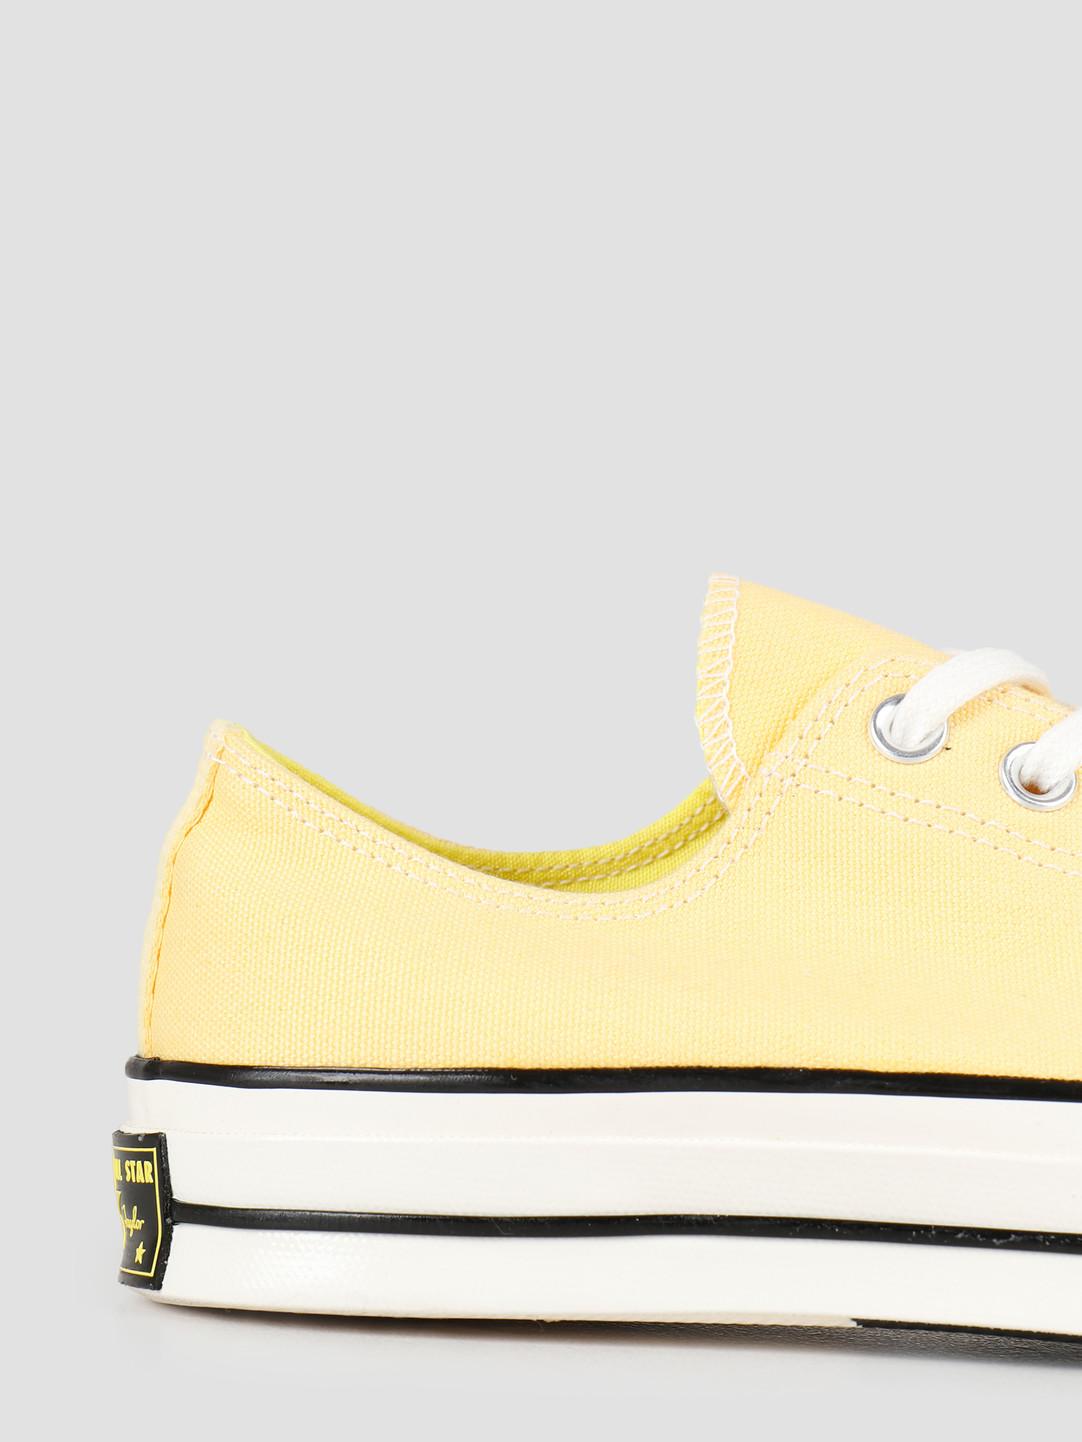 Converse Converse Chuck 70 Ox Butter Yellow Fresh Yellow 164214C